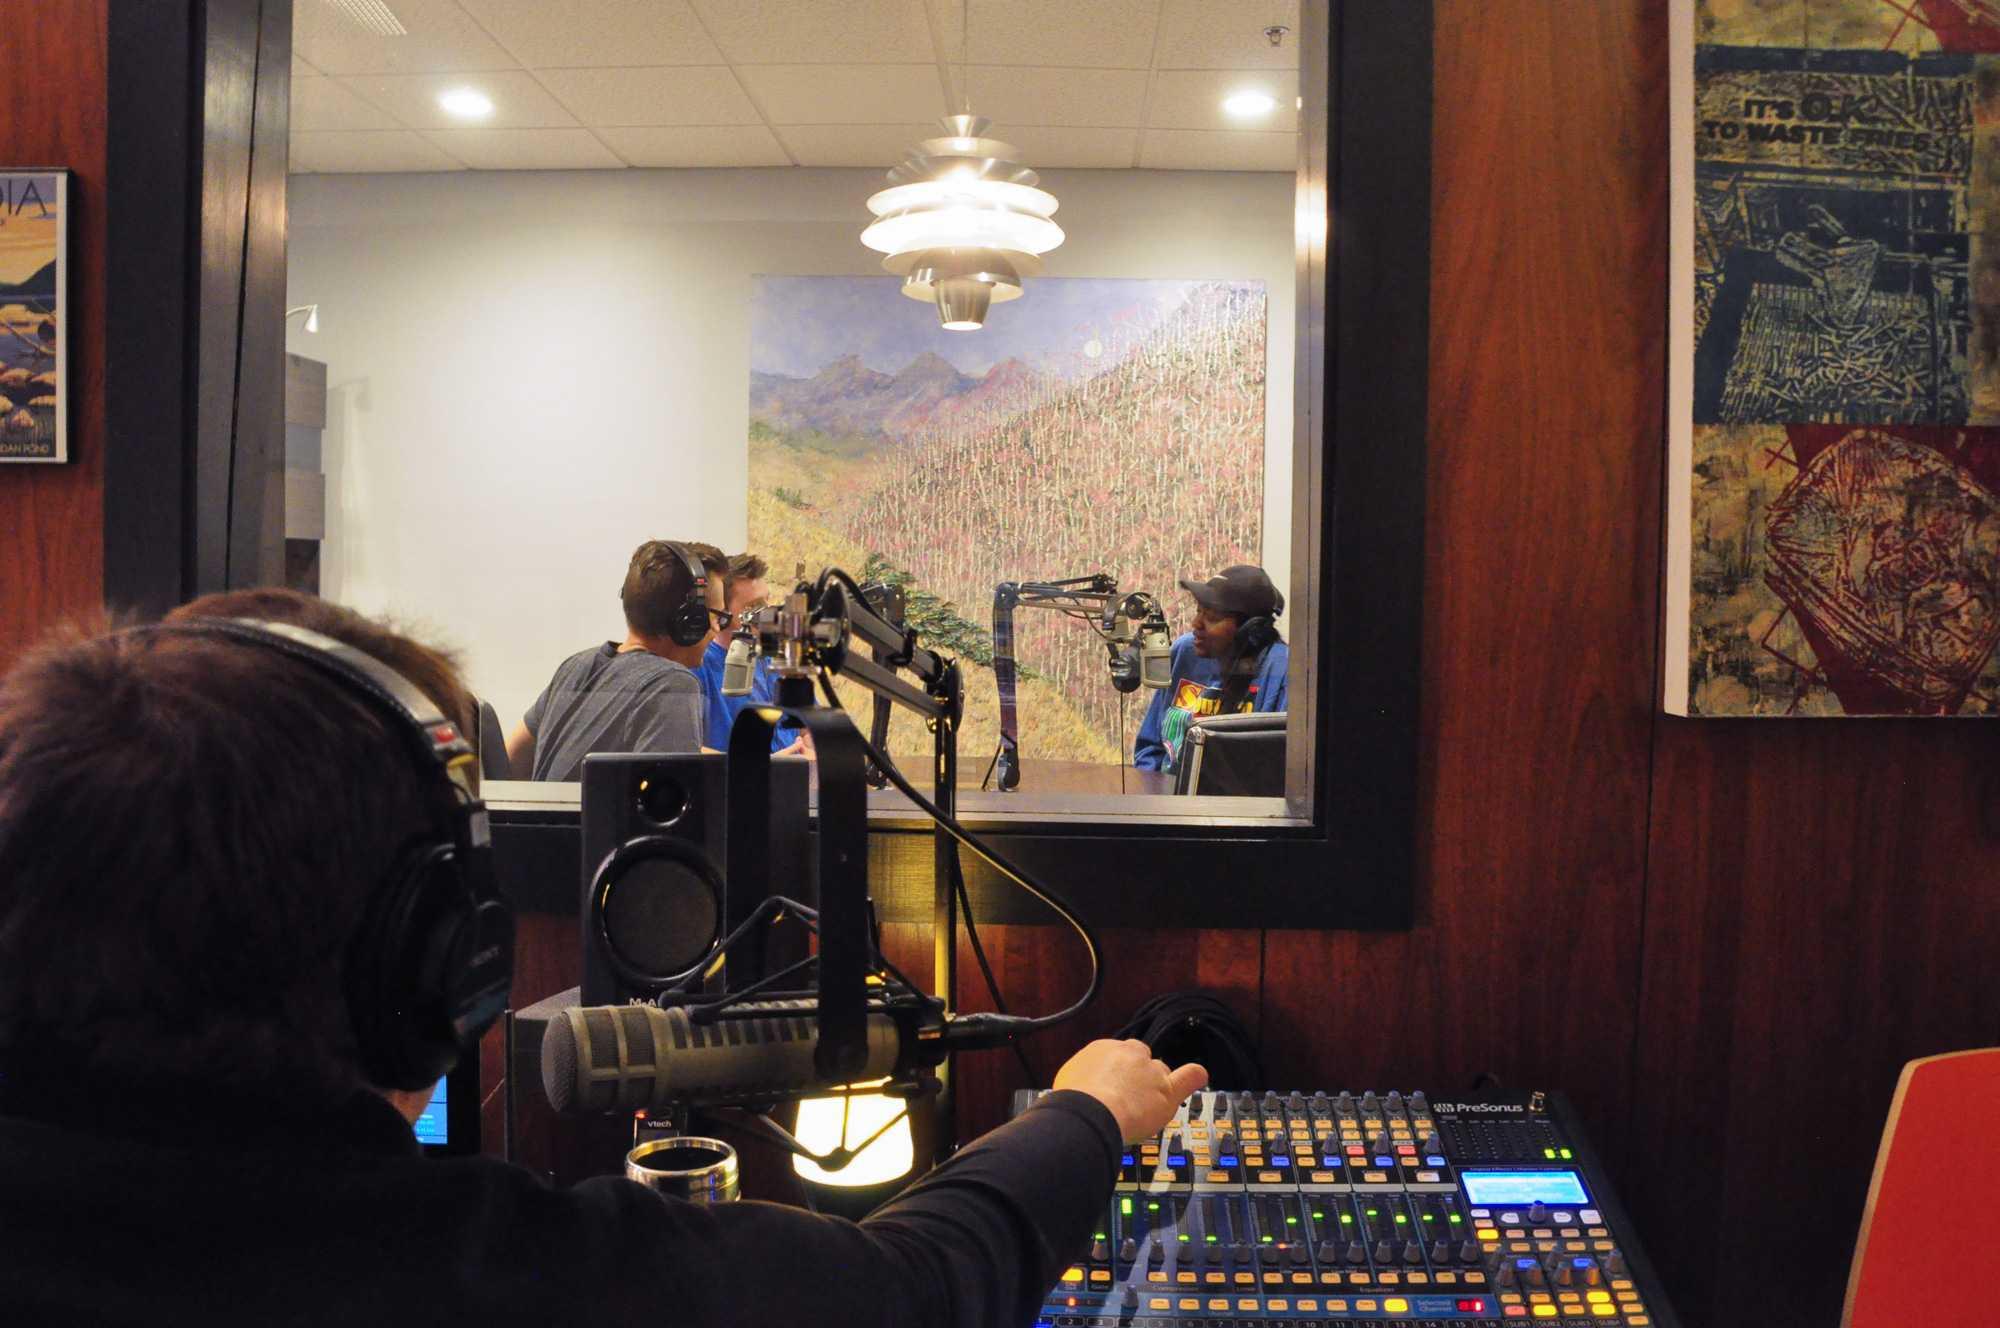 University podcast program goes far on limited budget